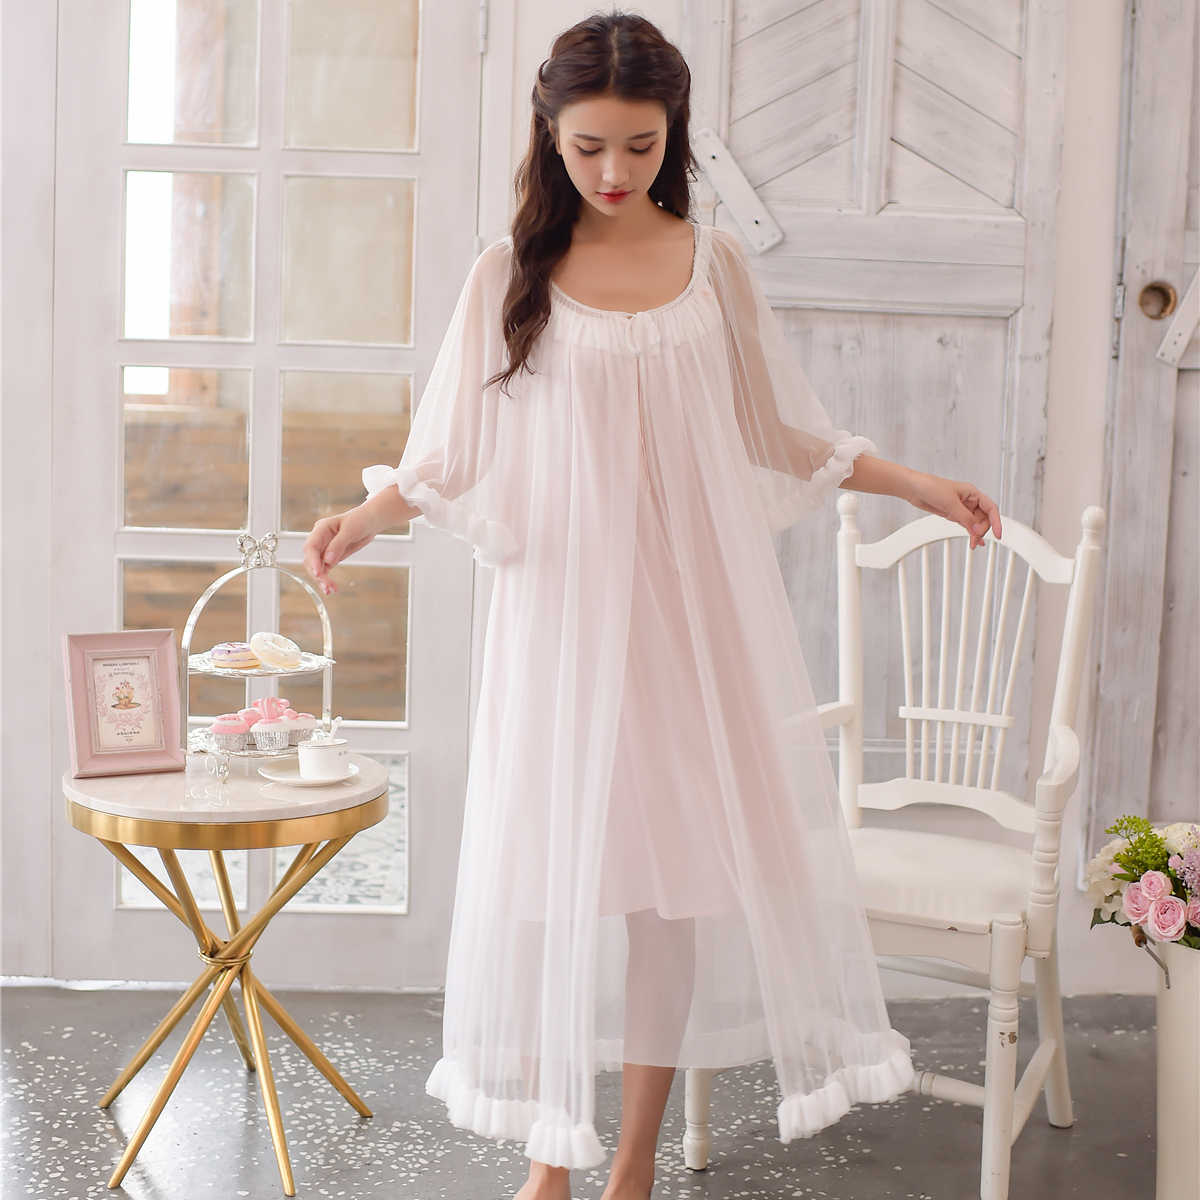 2018 Autumn 2PICS Vintage sleepwear Modal lining nightgown Princess design nightgown  long lace nightdress Arab Lady 5880f96ea